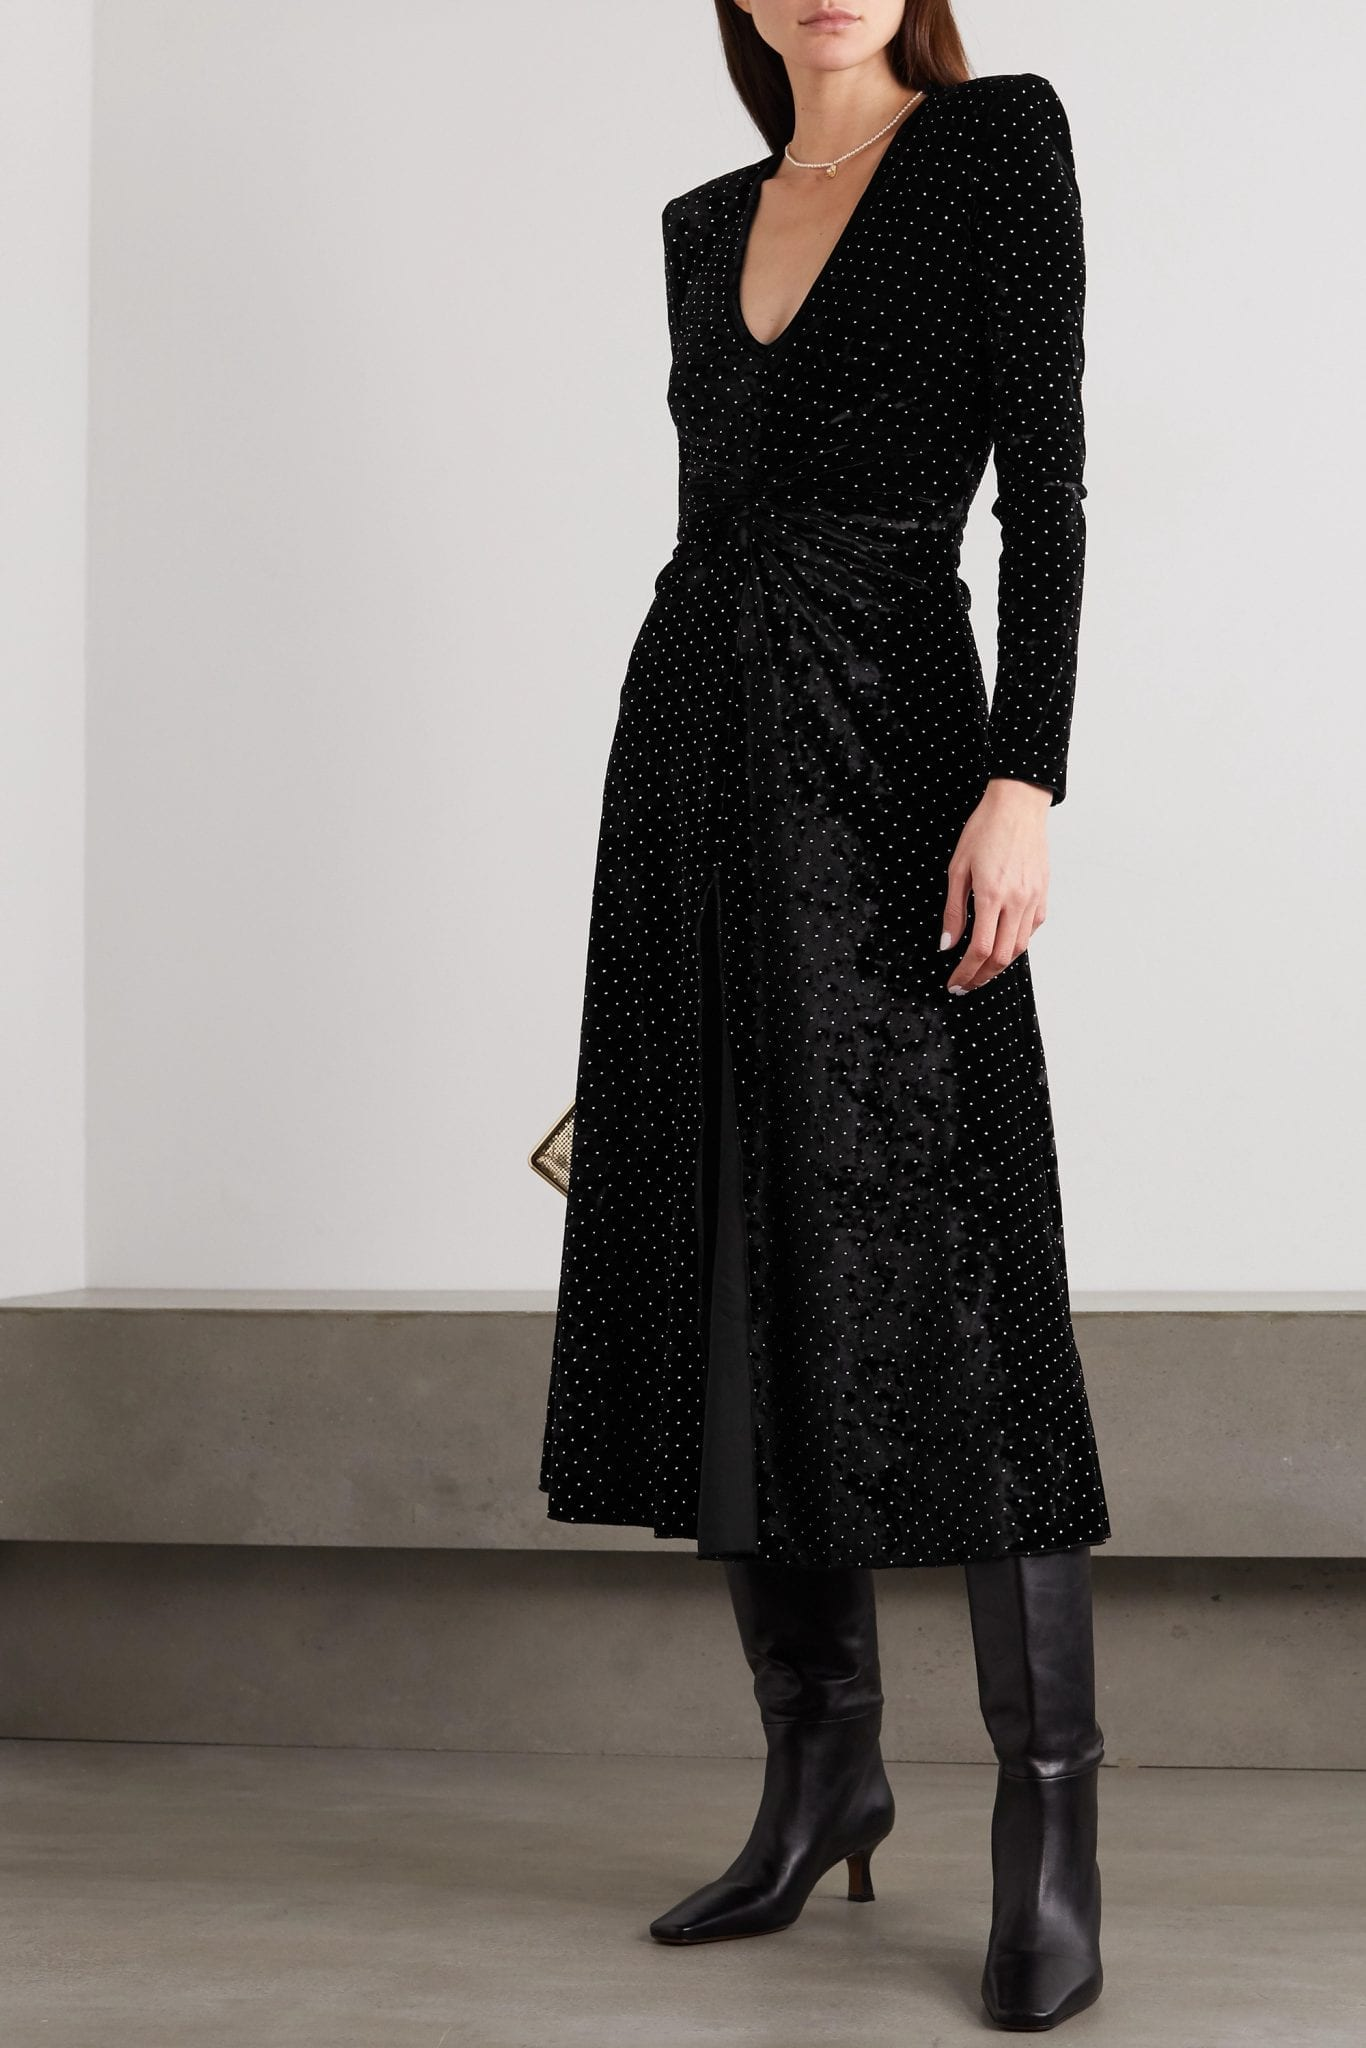 ROTATE BIRGER CHRISTENSEN Lily Gathered Studded Stretch-velvet Midi Dress